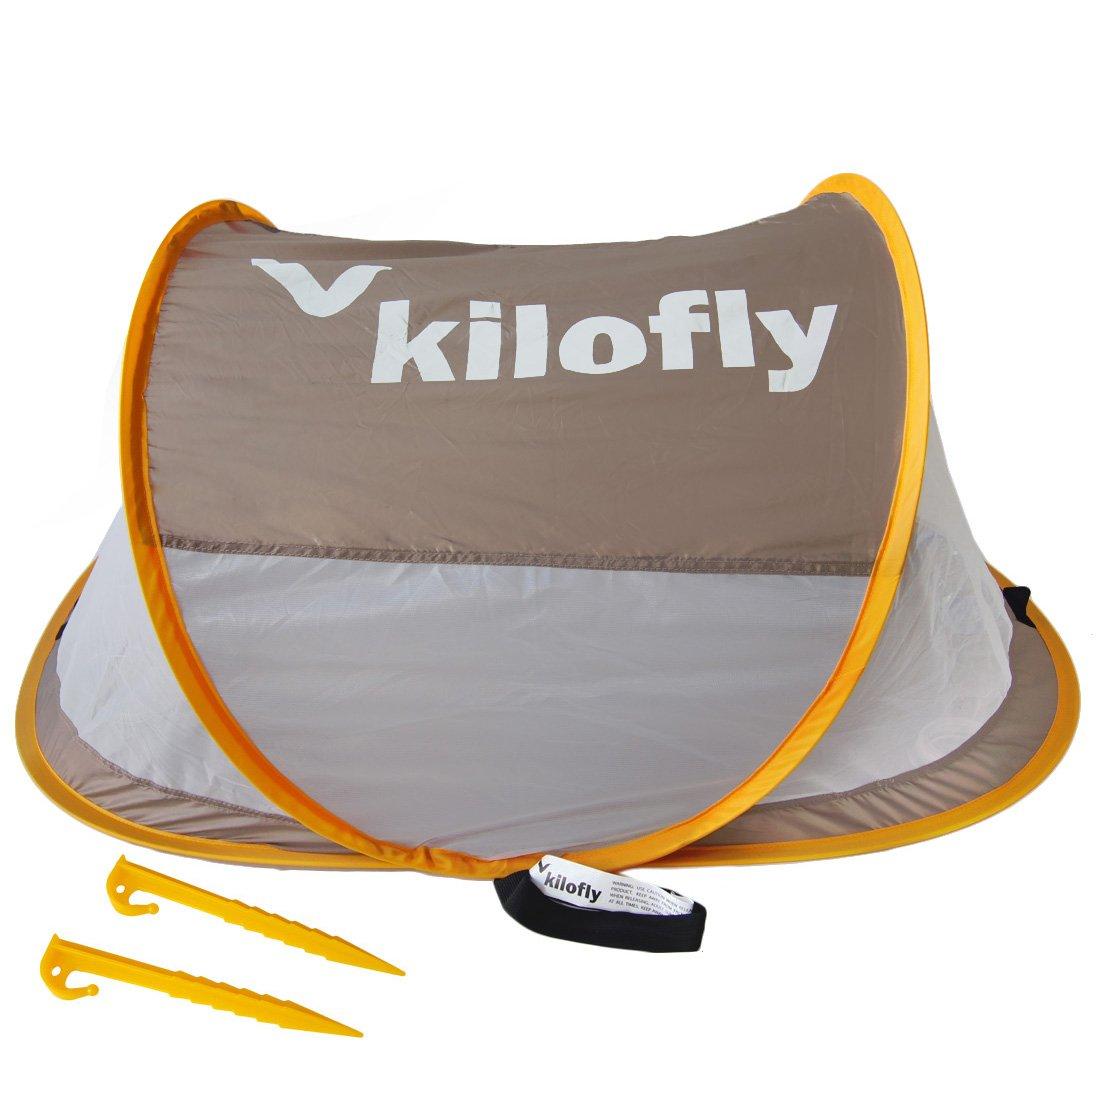 kilofly Flat Top Instant Pop Up Portable UPF 35+ Travel Baby Beach Tent + 2 Pegs